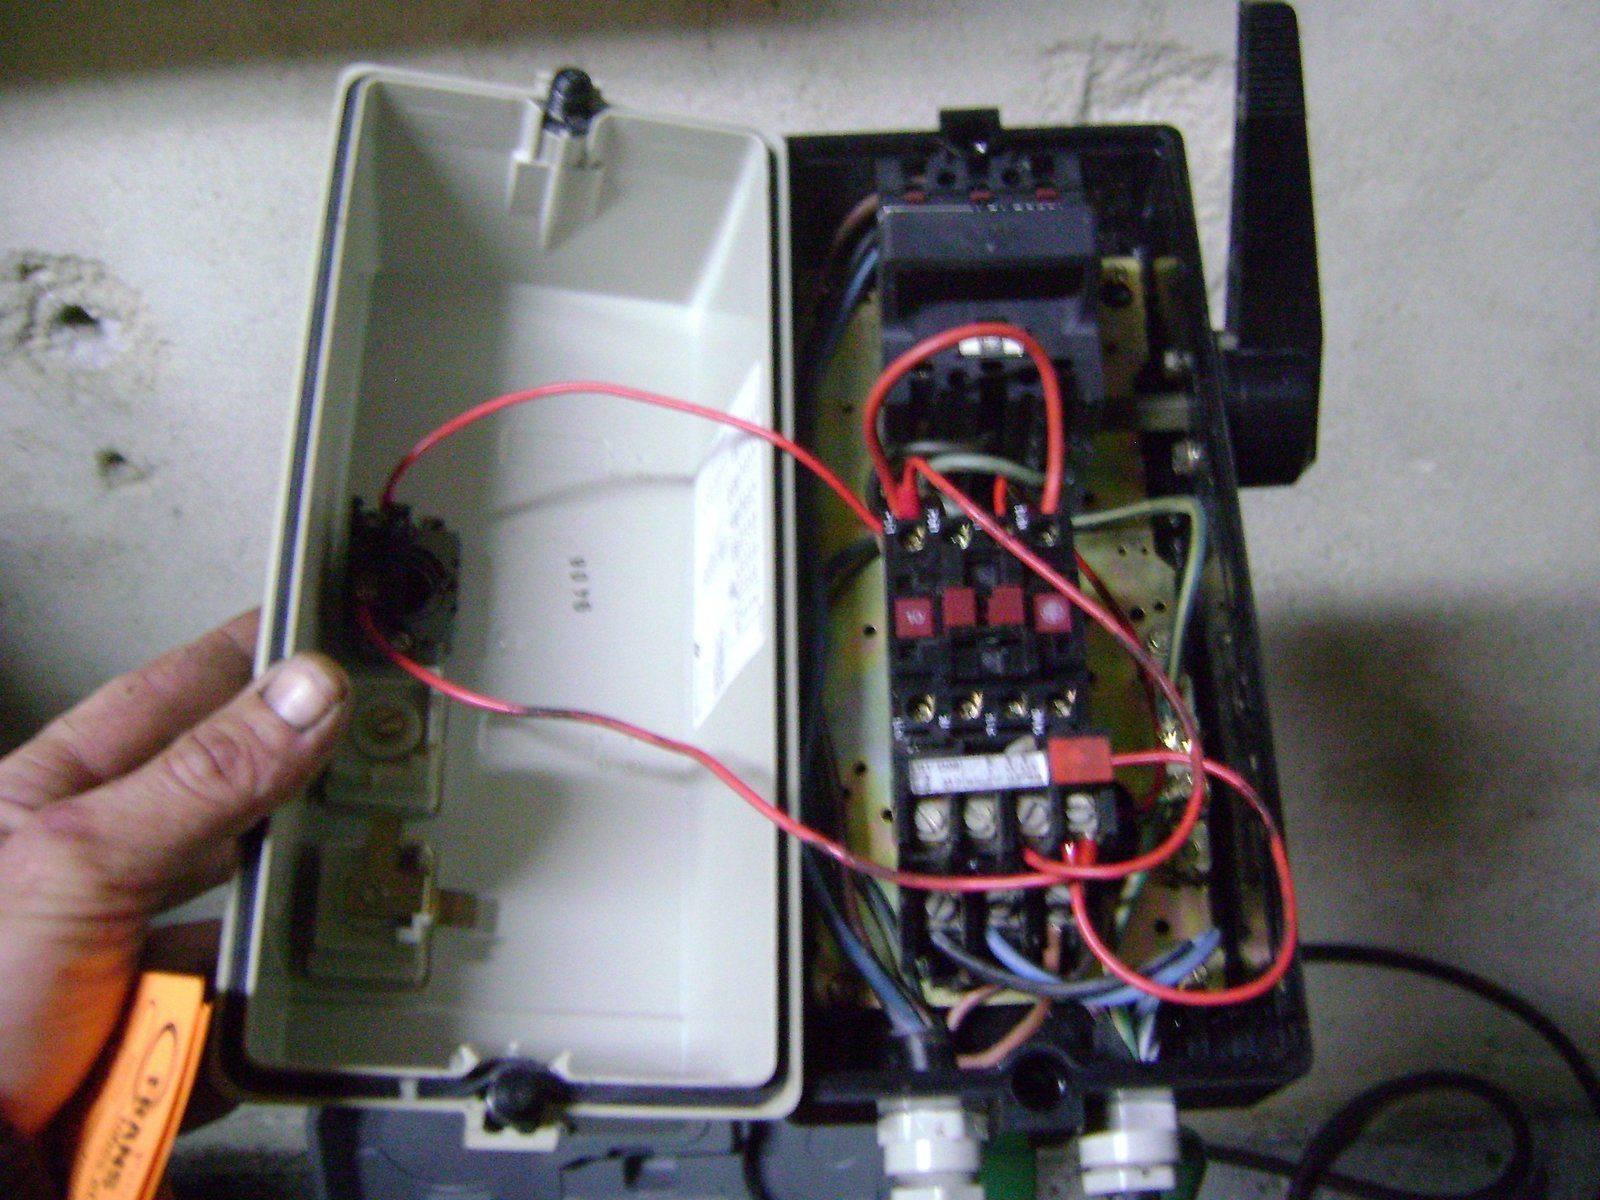 DSC00785.JPG